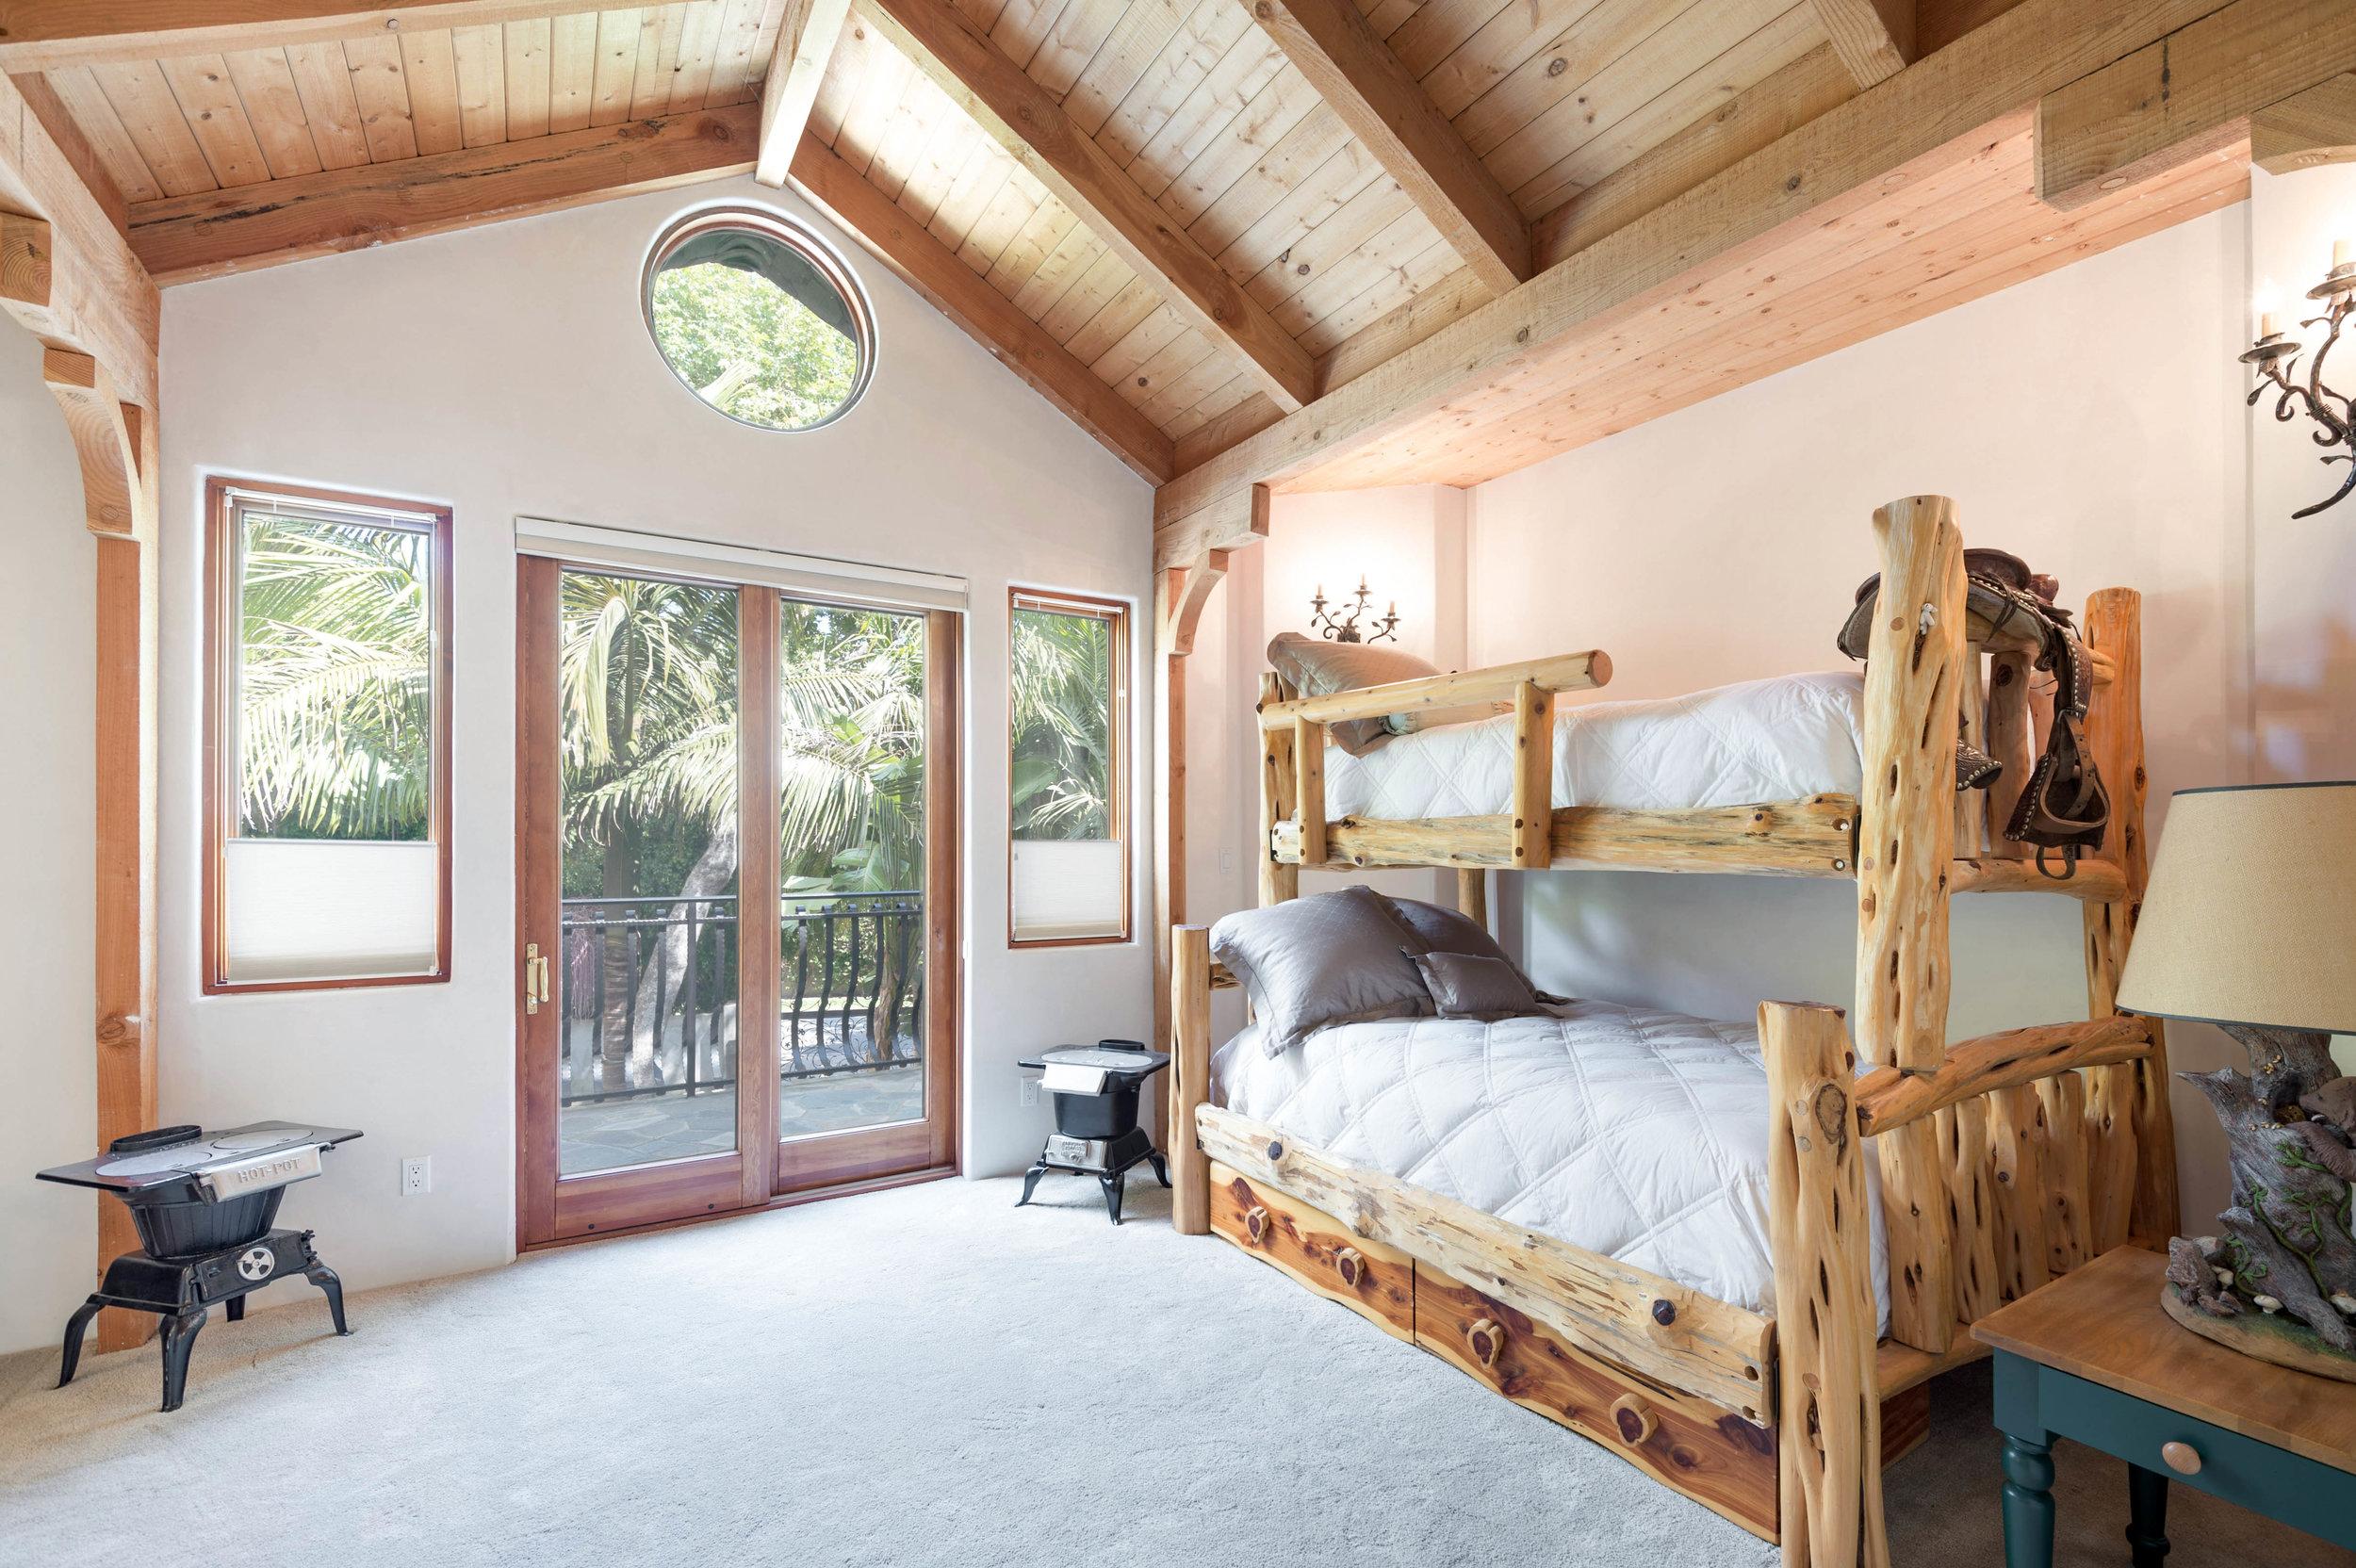 021 guest bedroom 3 6405 bonsall Malibu For Sale The Malibu Life Team Luxury Real Estate.jpg